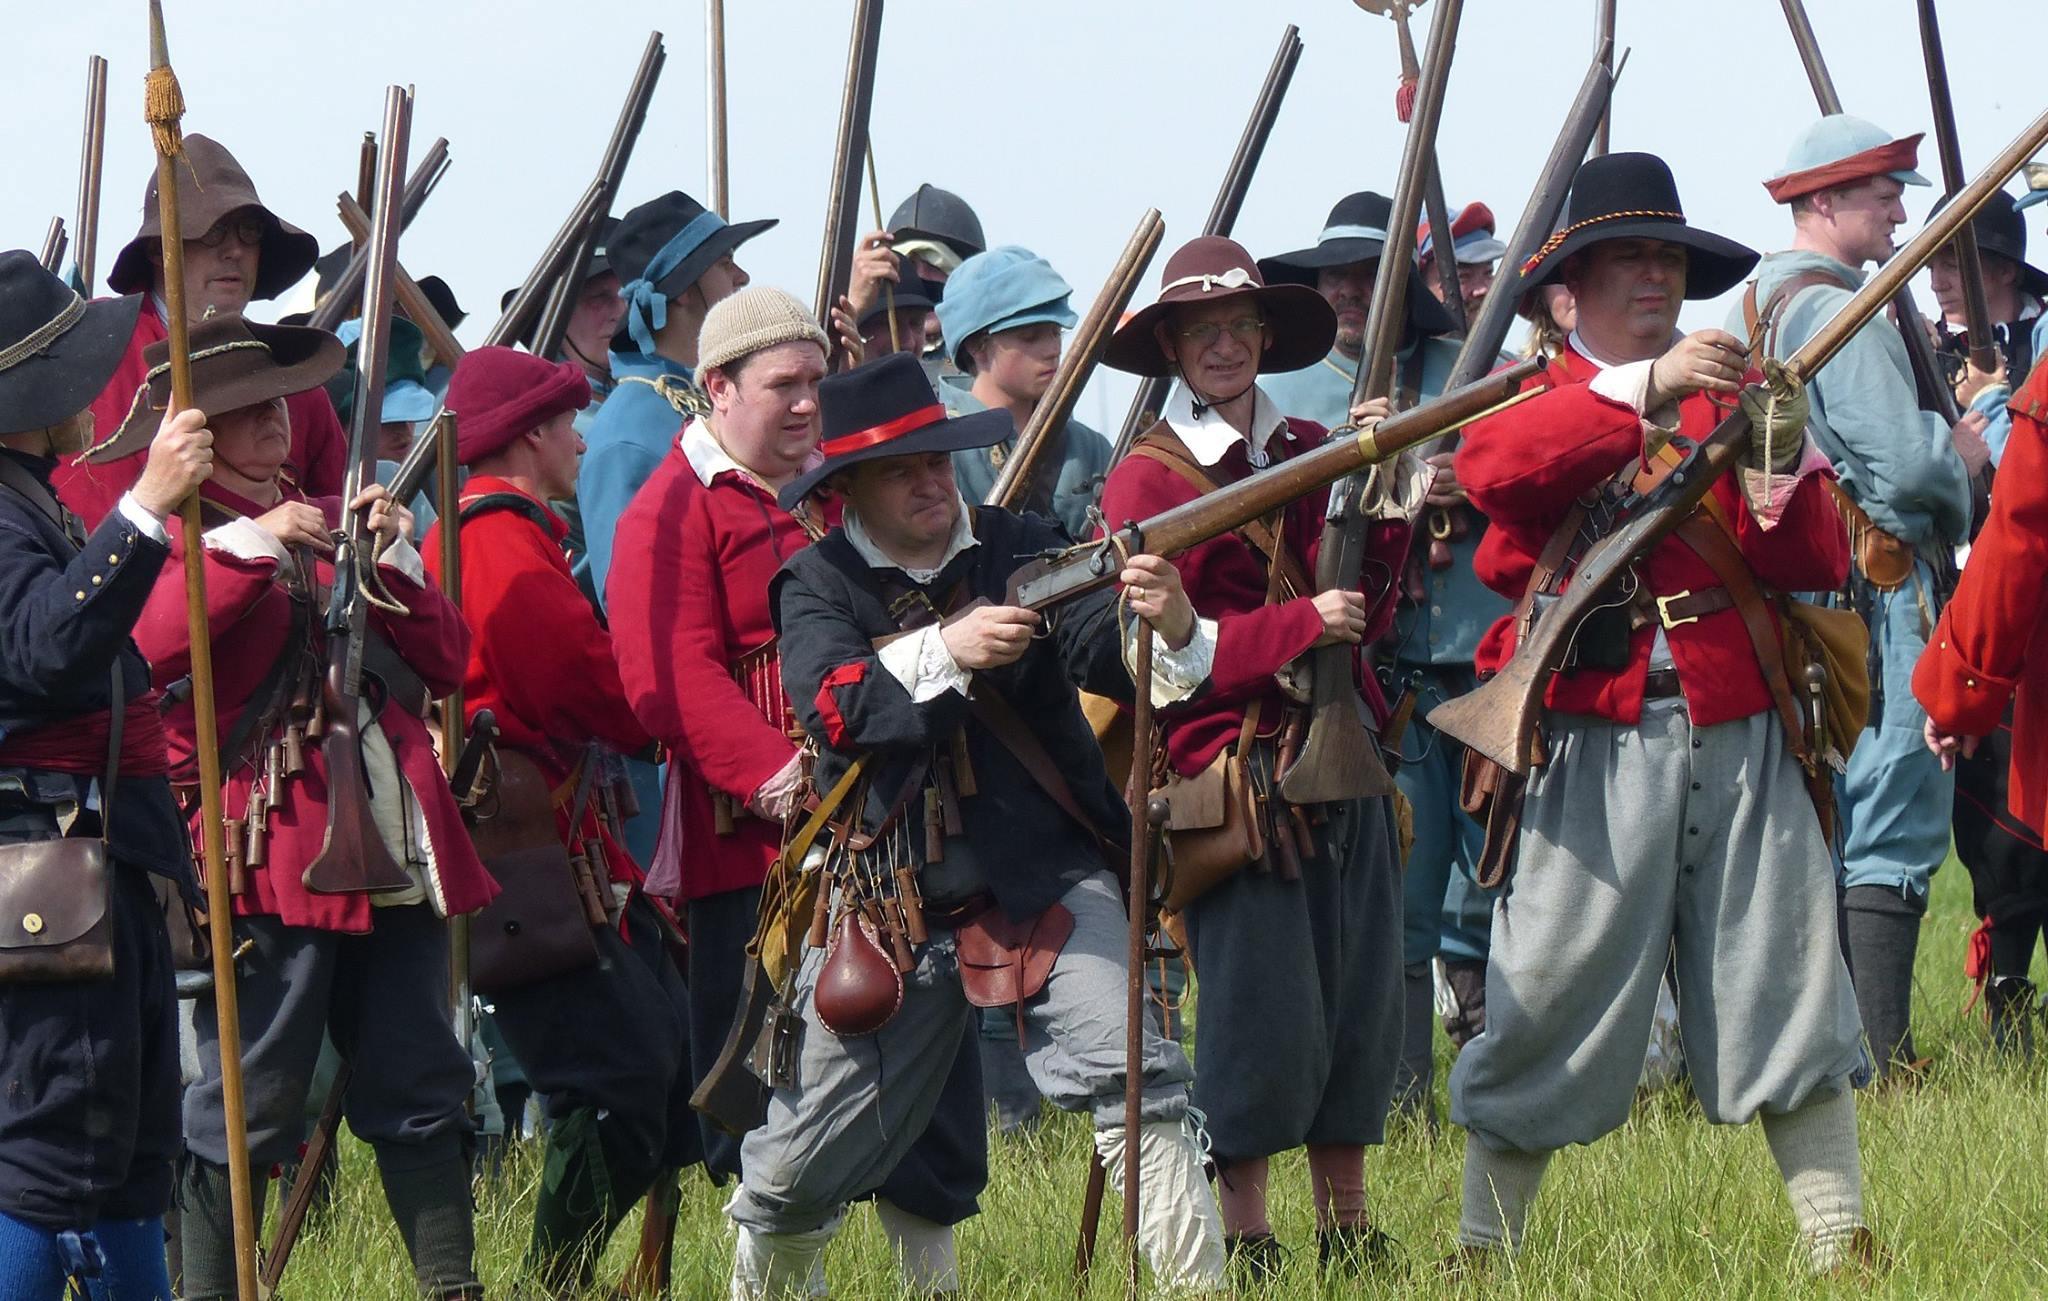 Musketeers at Marlborough